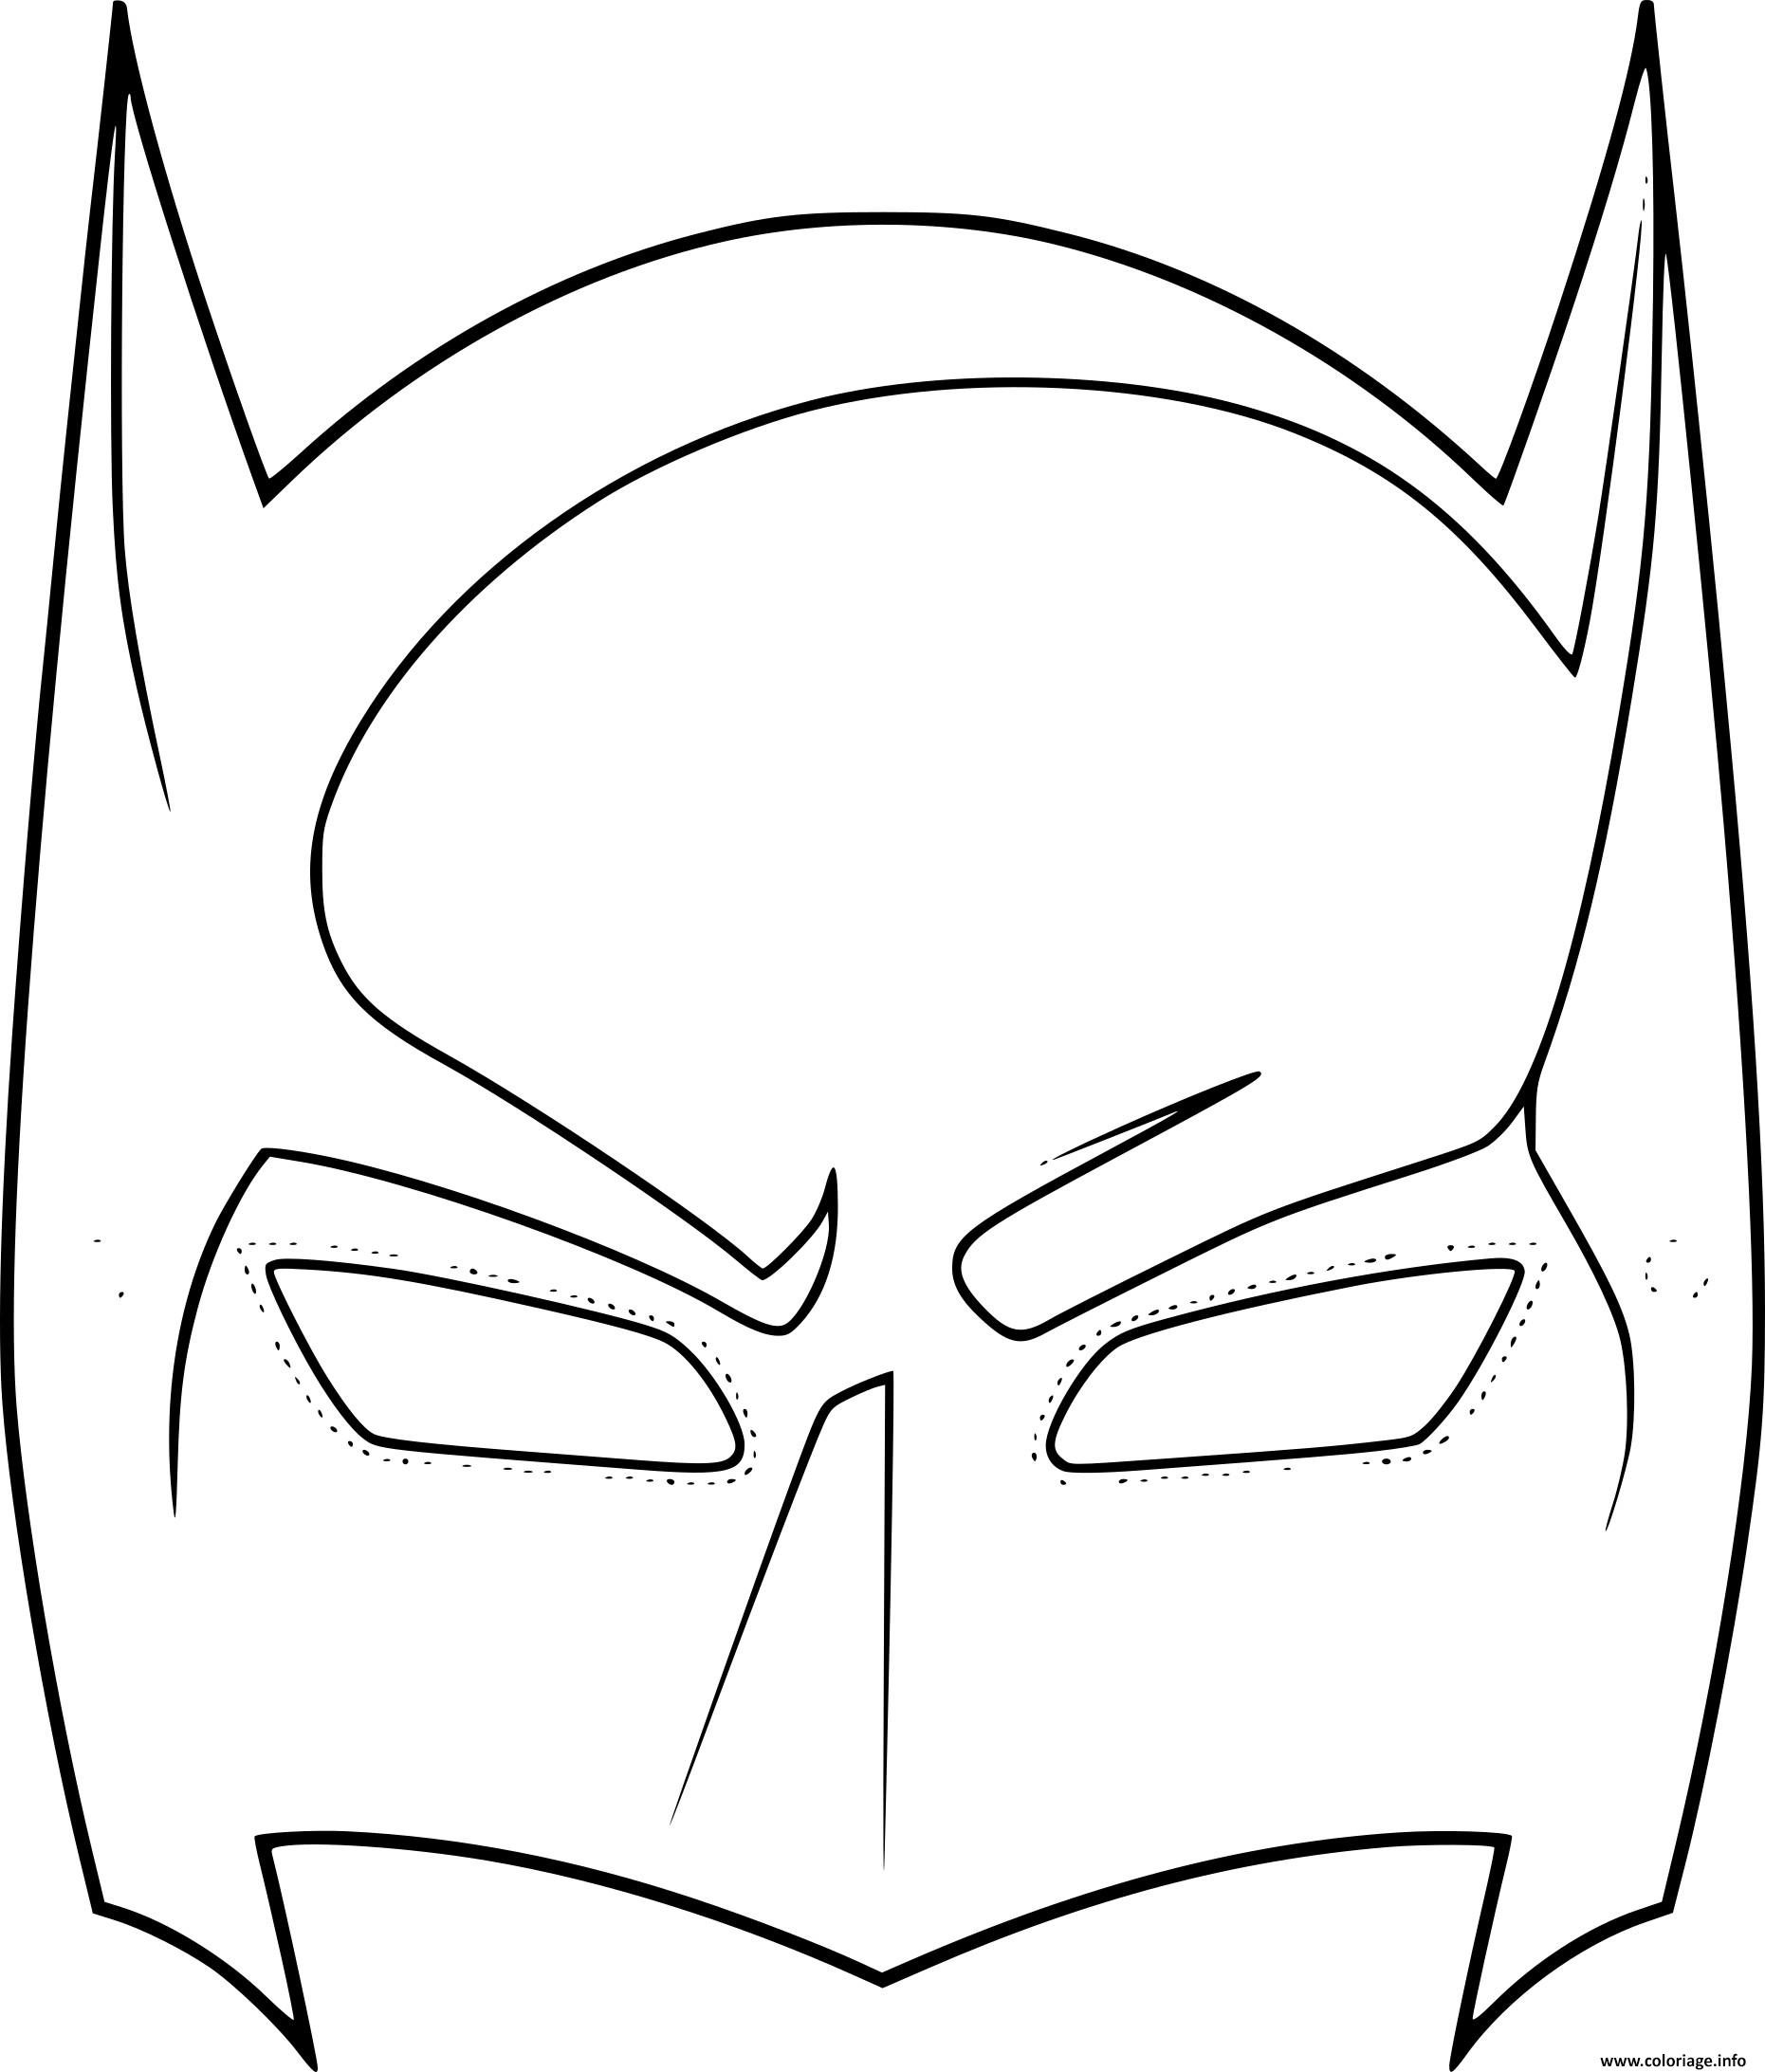 Coloriage Masque De Batman Dessin destiné Masque Spiderman A Imprimer